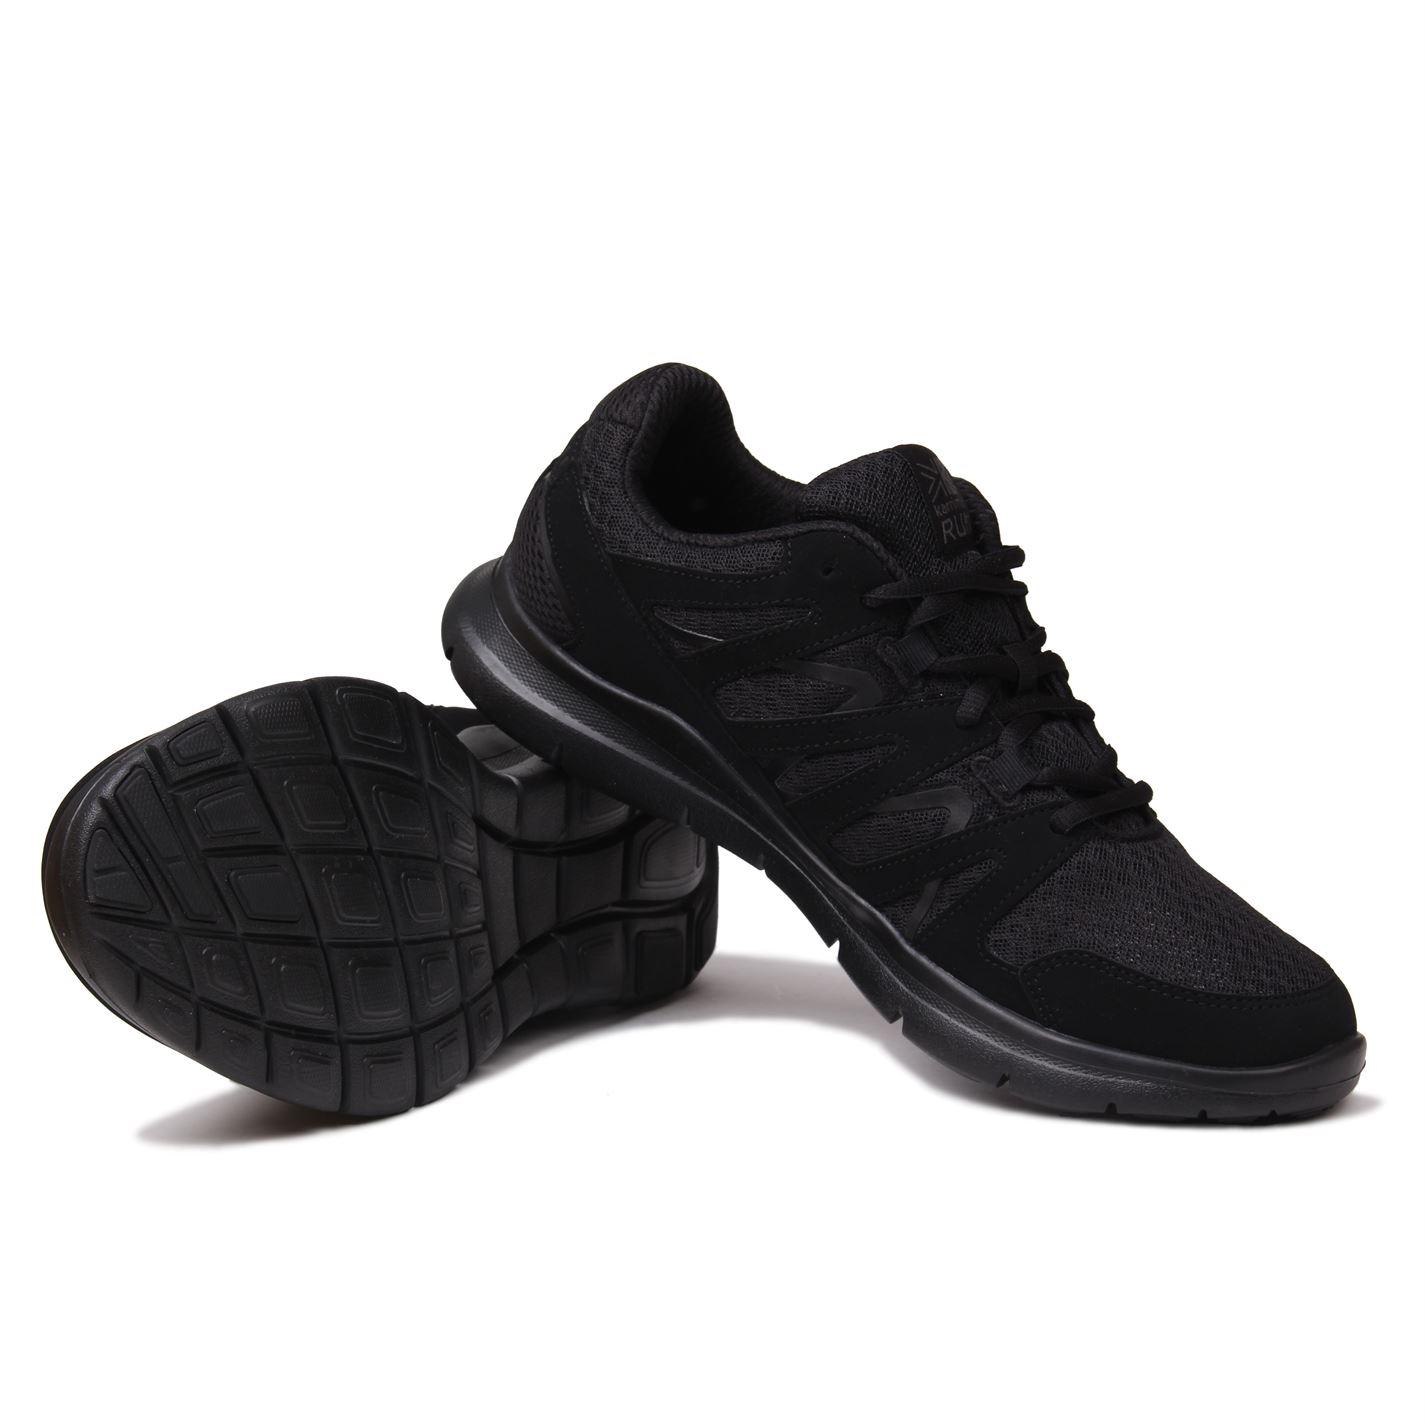 Karrimor-Mens-Duma-Trainers-Lace-Up-Sports-Running-Cross-Training-Shoes thumbnail 37